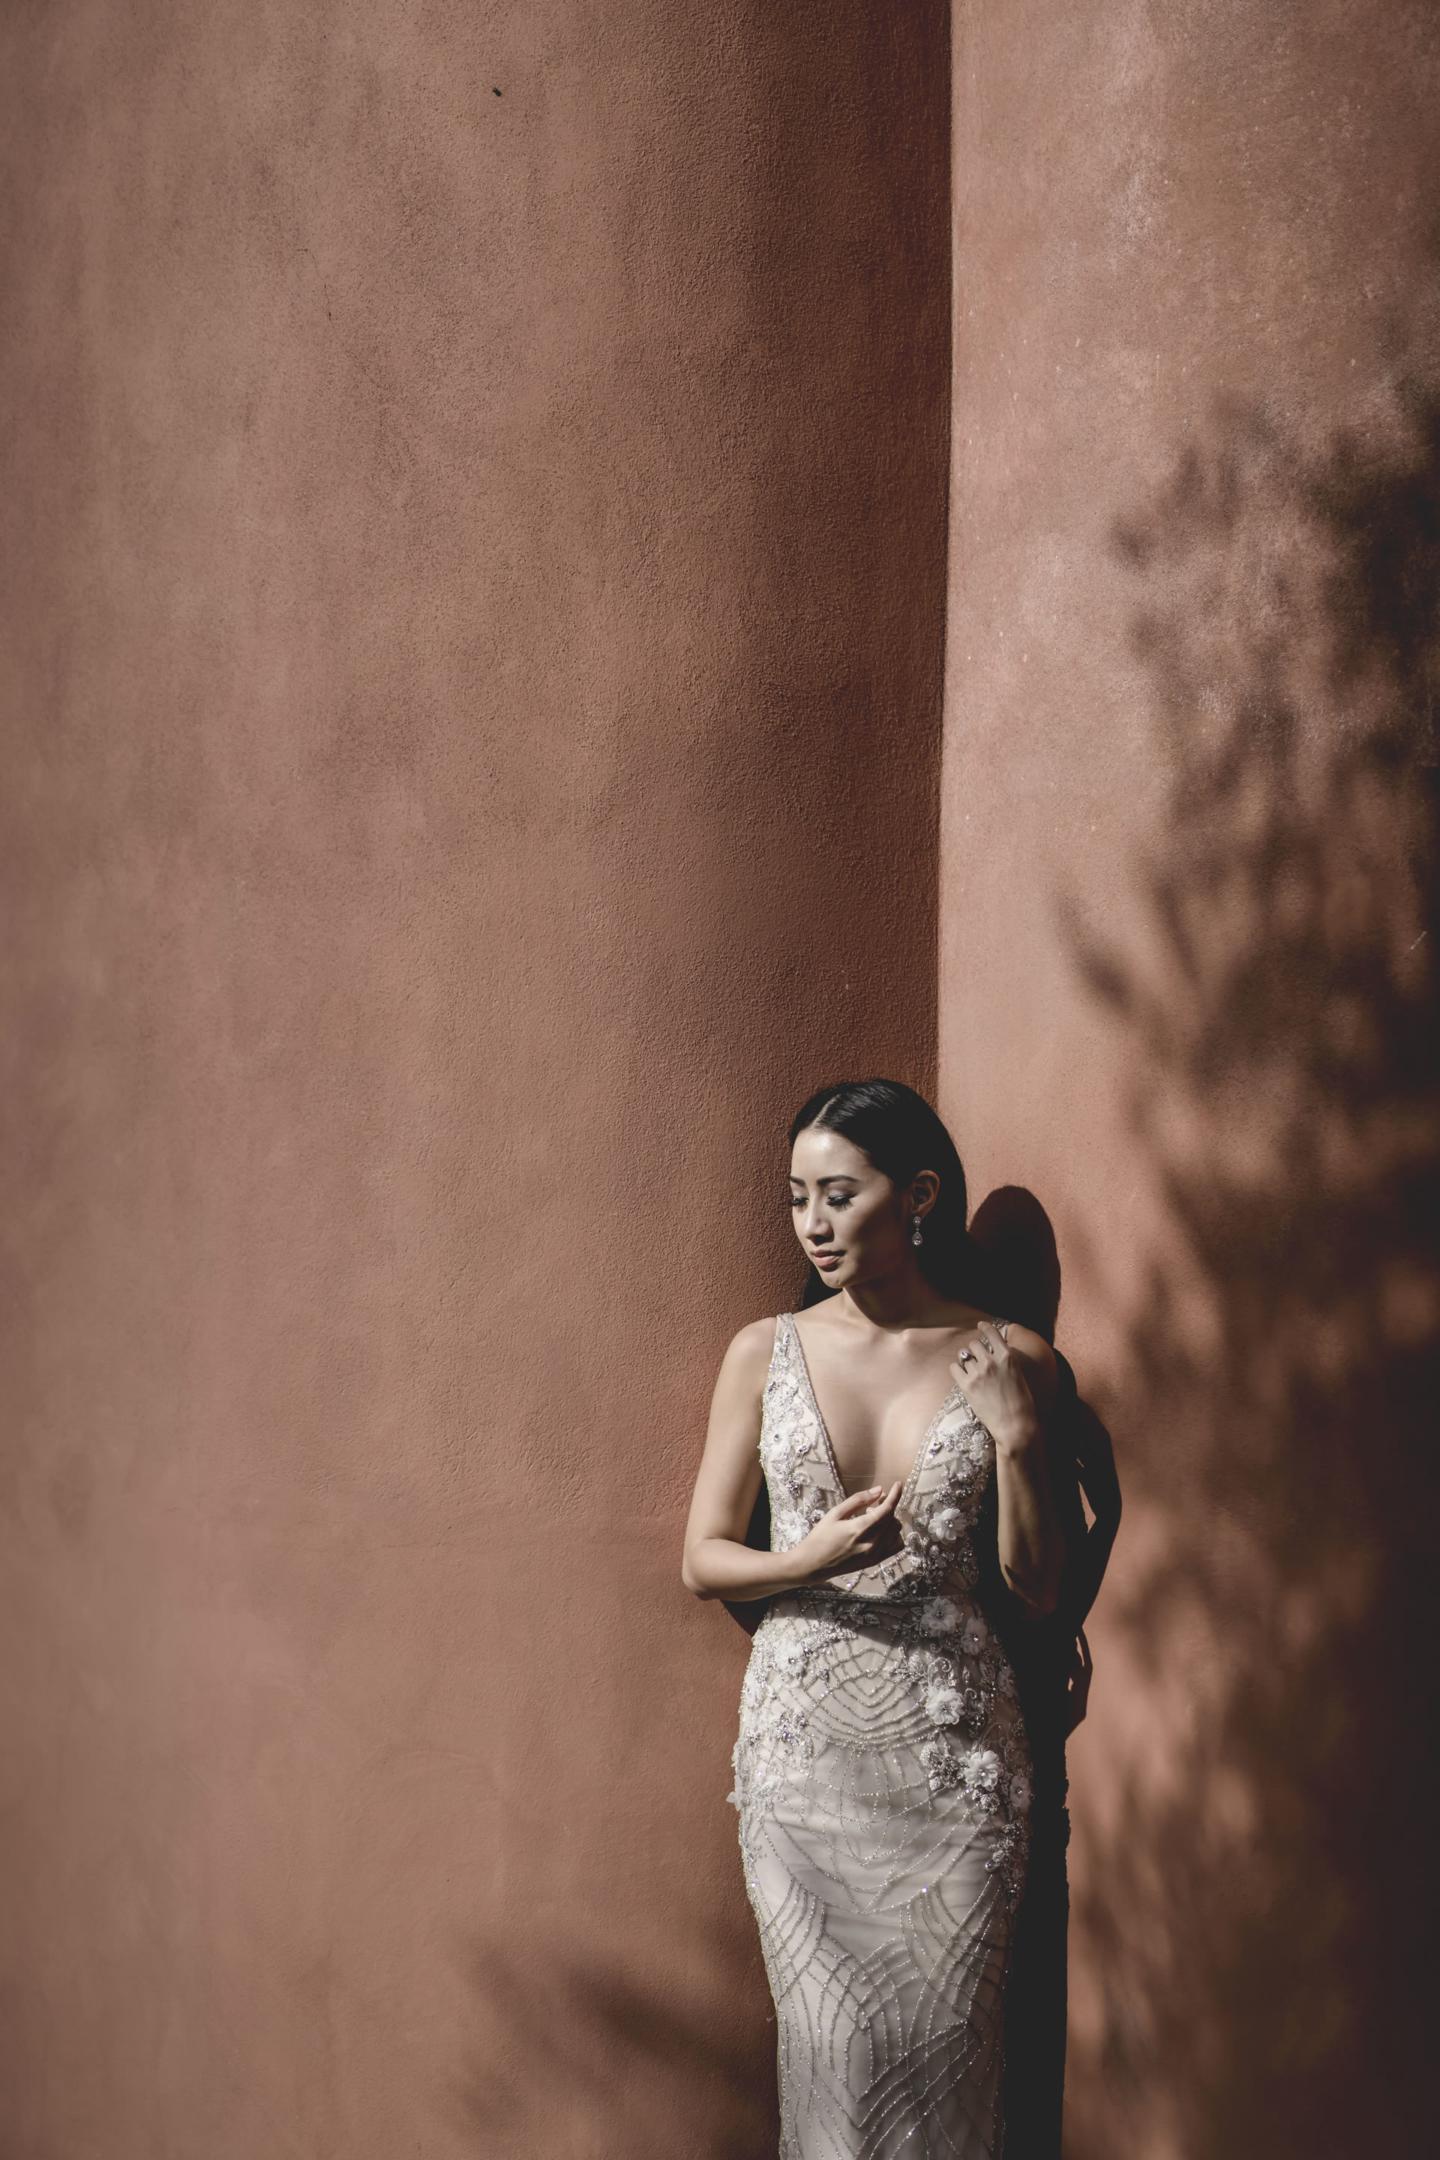 Bride portrait: when beauty comes from happiness :: Bride's portrait: when beauty comes from happiness :: Luxury wedding photography - 18 :: Bride portrait: when beauty comes from happiness